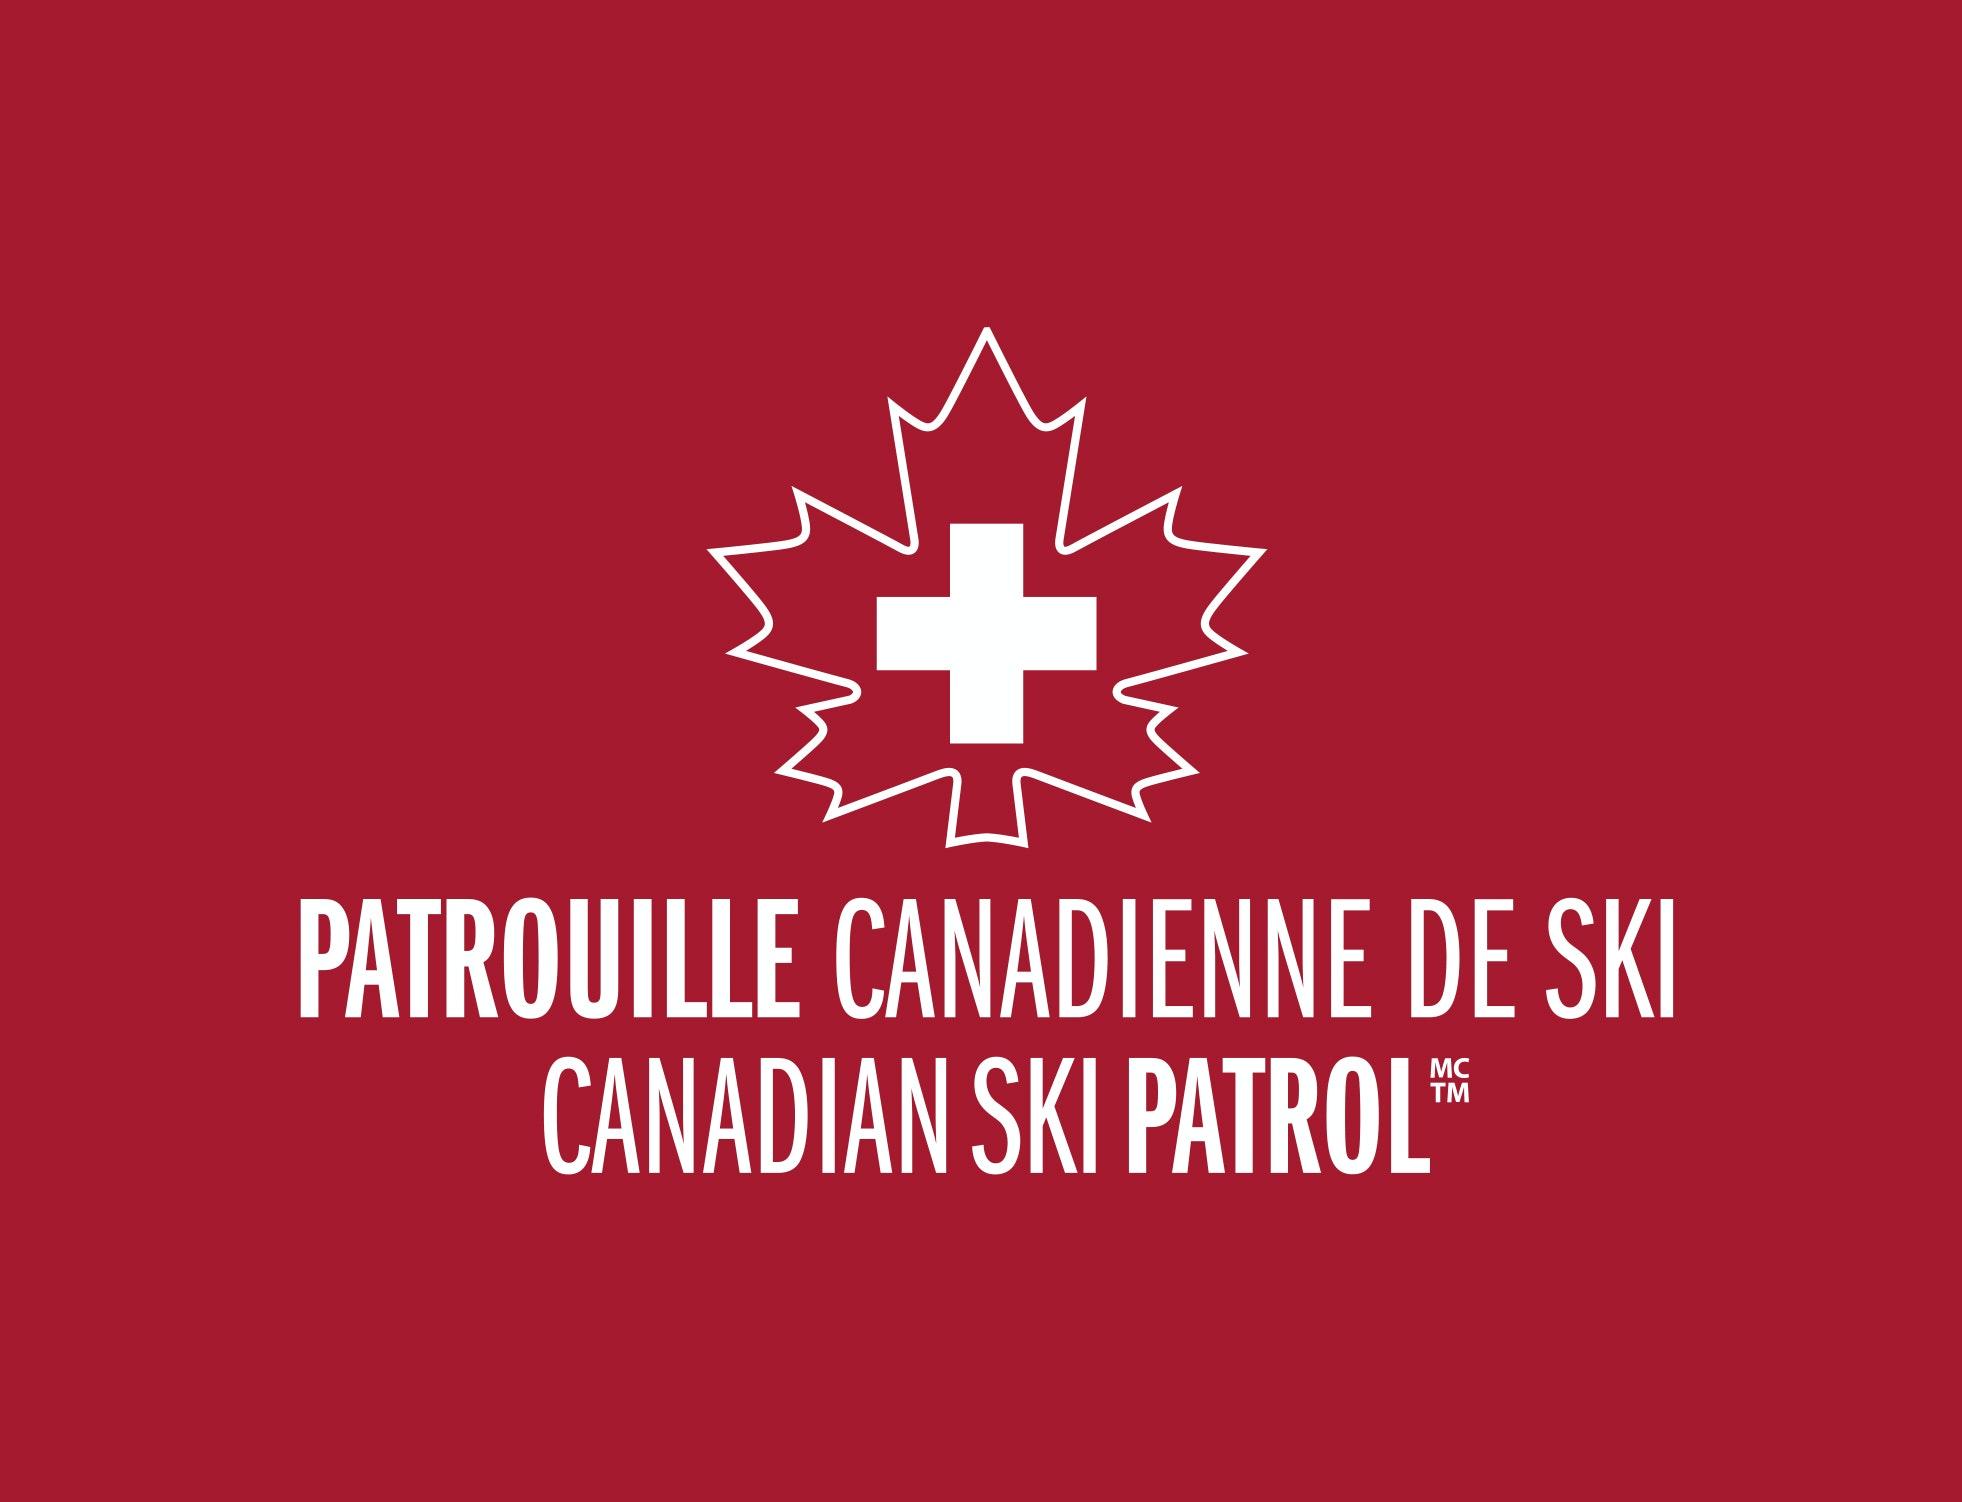 Canadian Ski Patrol - Patrouille Canadienne de Ski